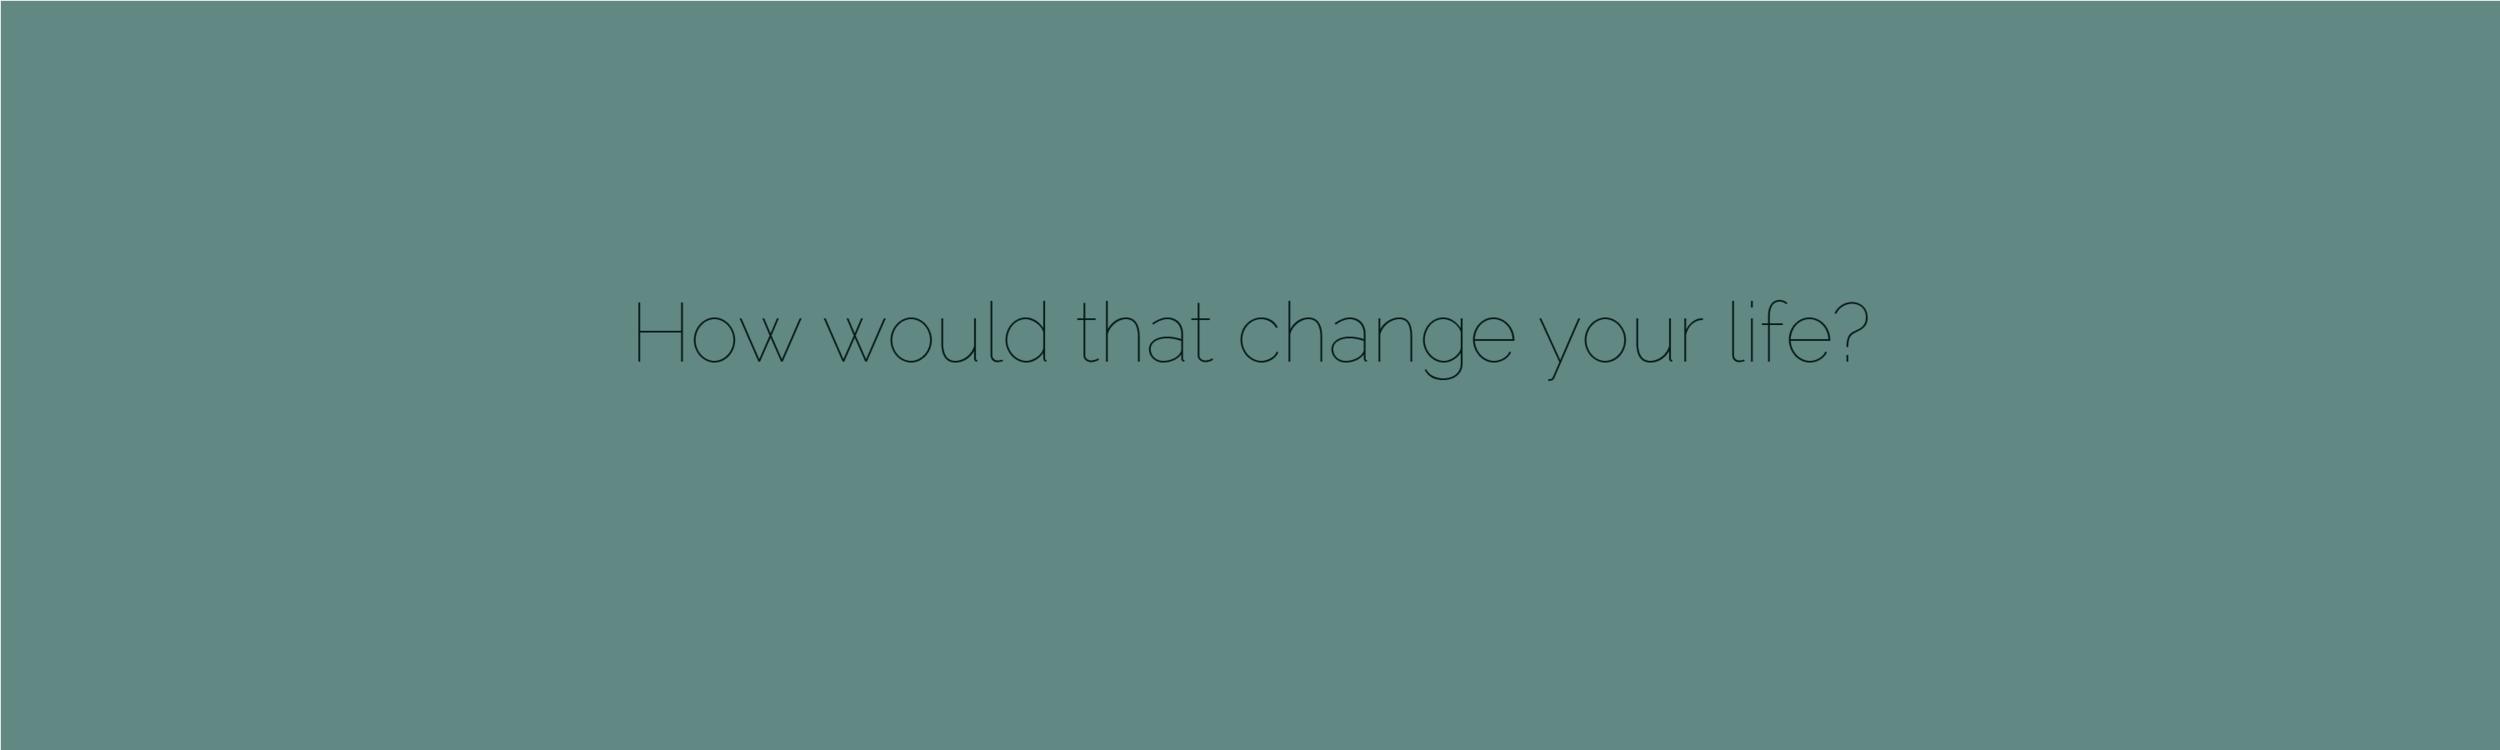 change_your_life_harmony_restored.jpg